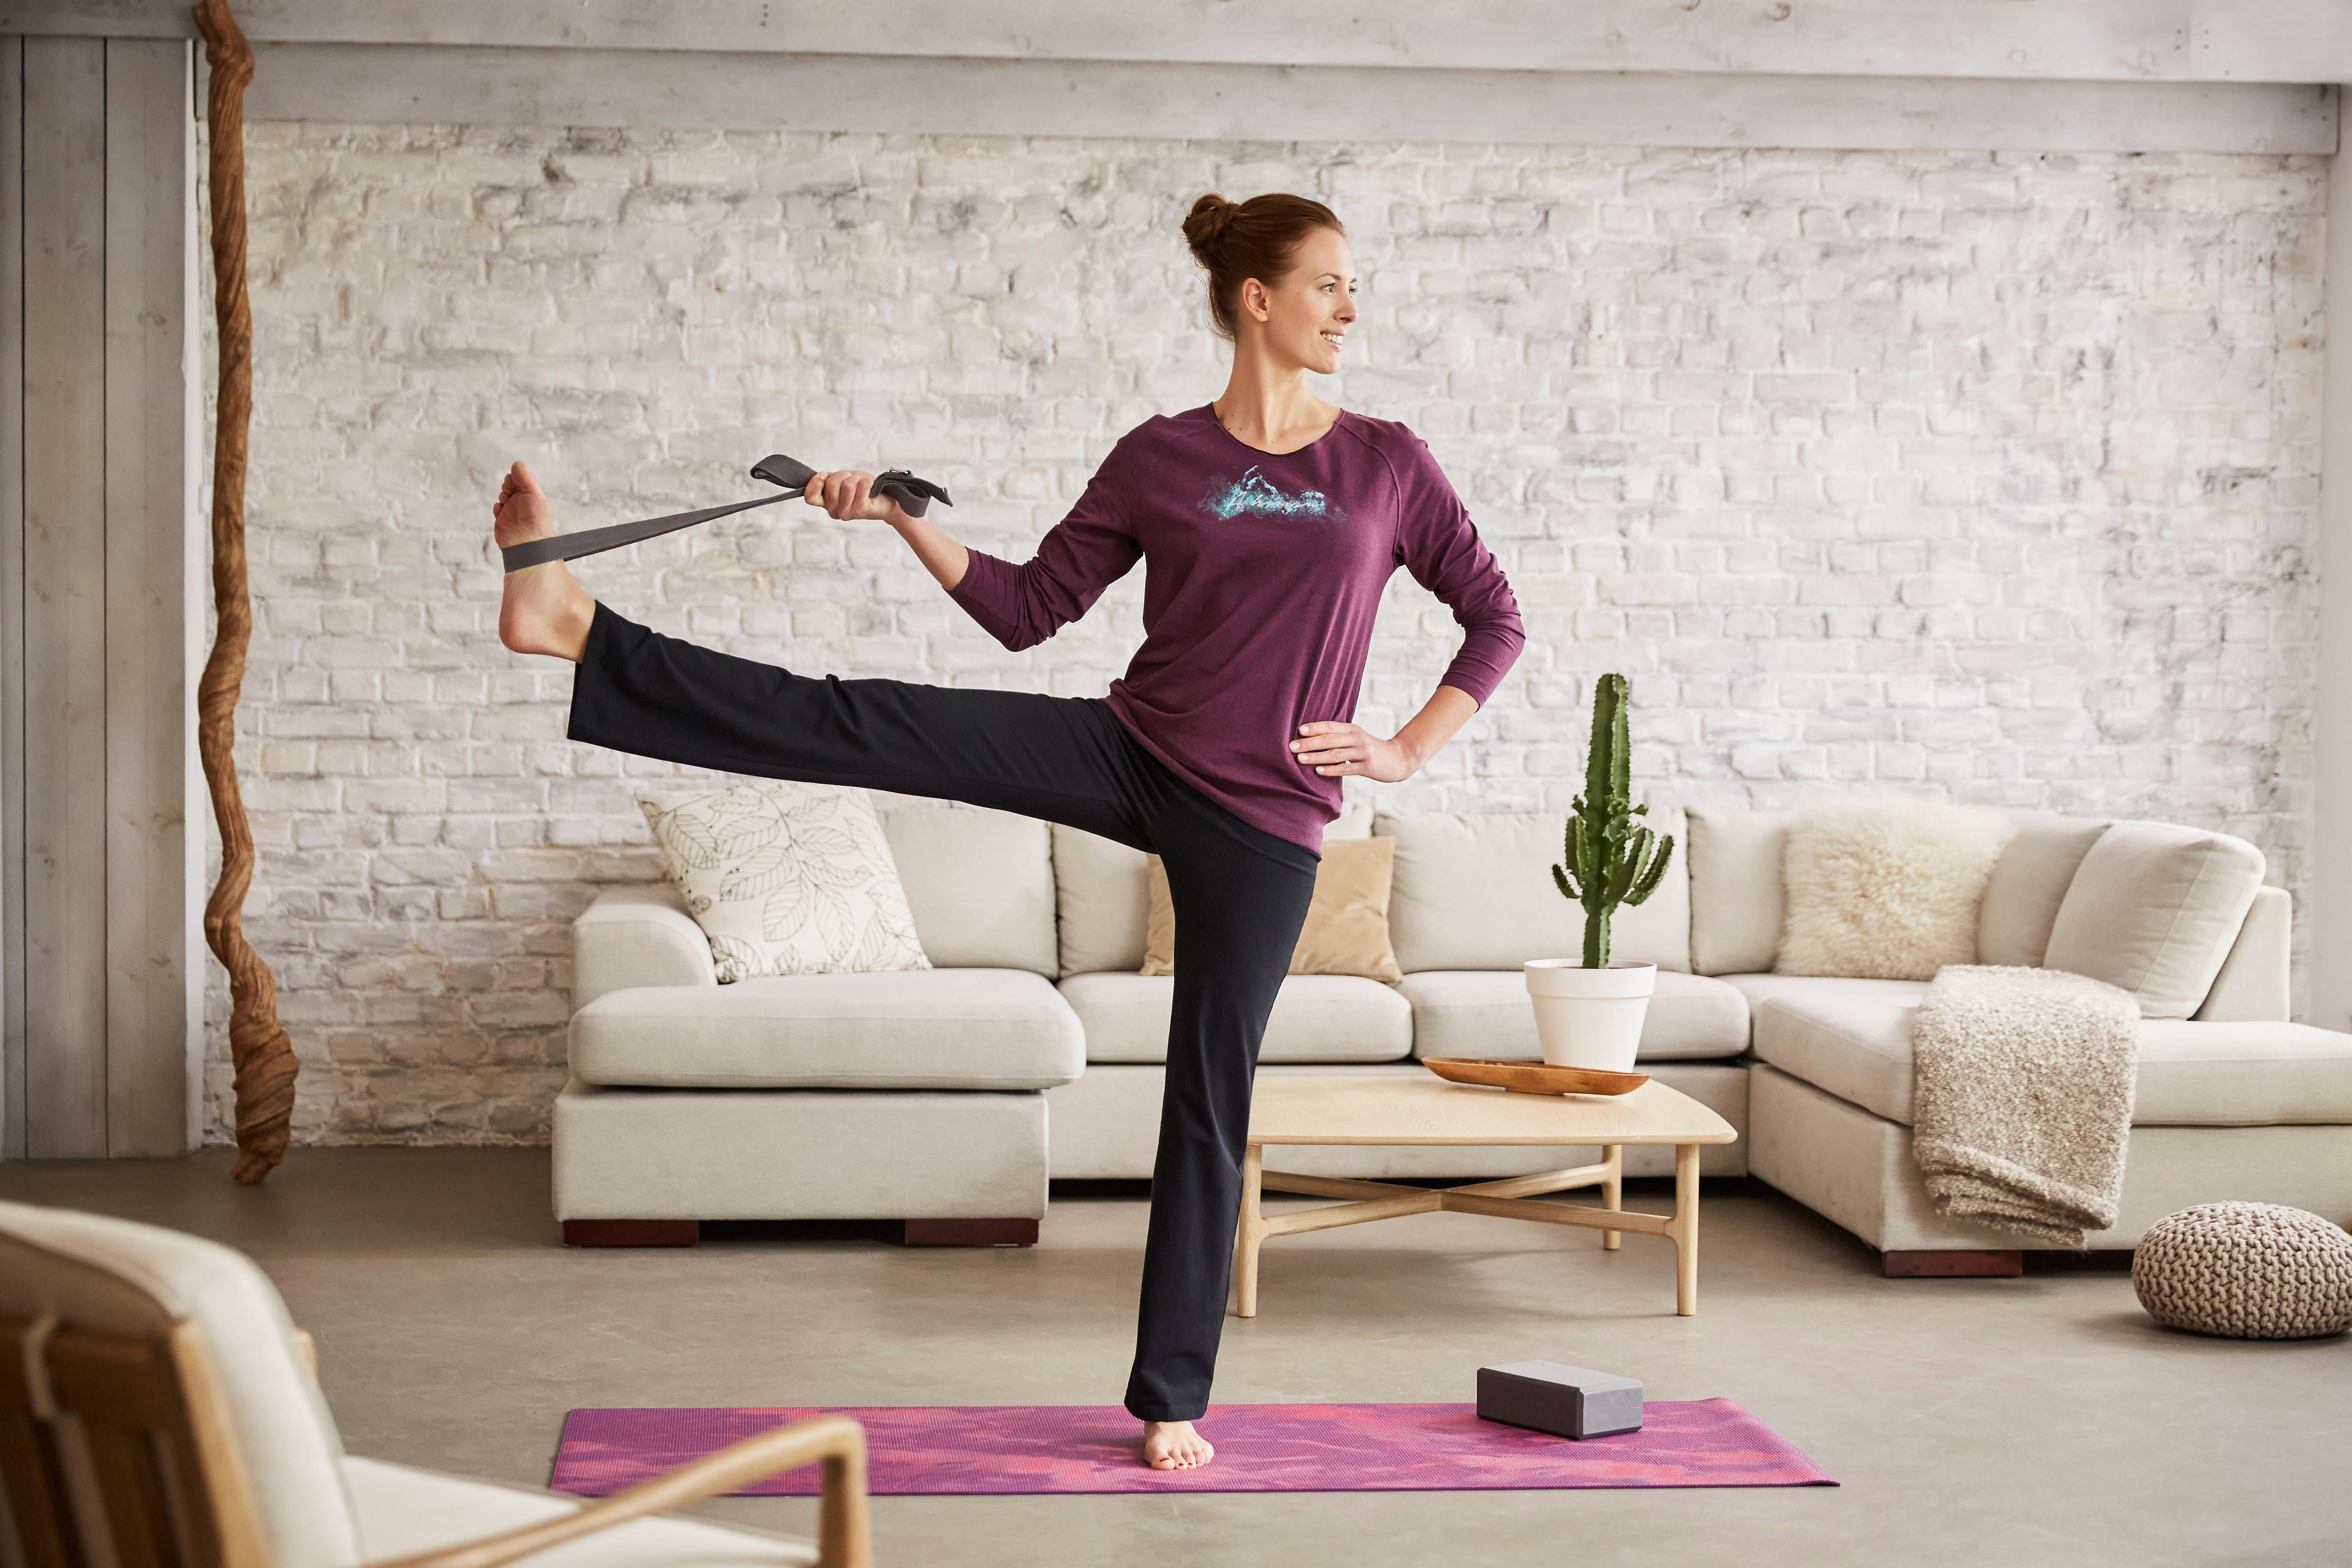 yogamat1.jpg